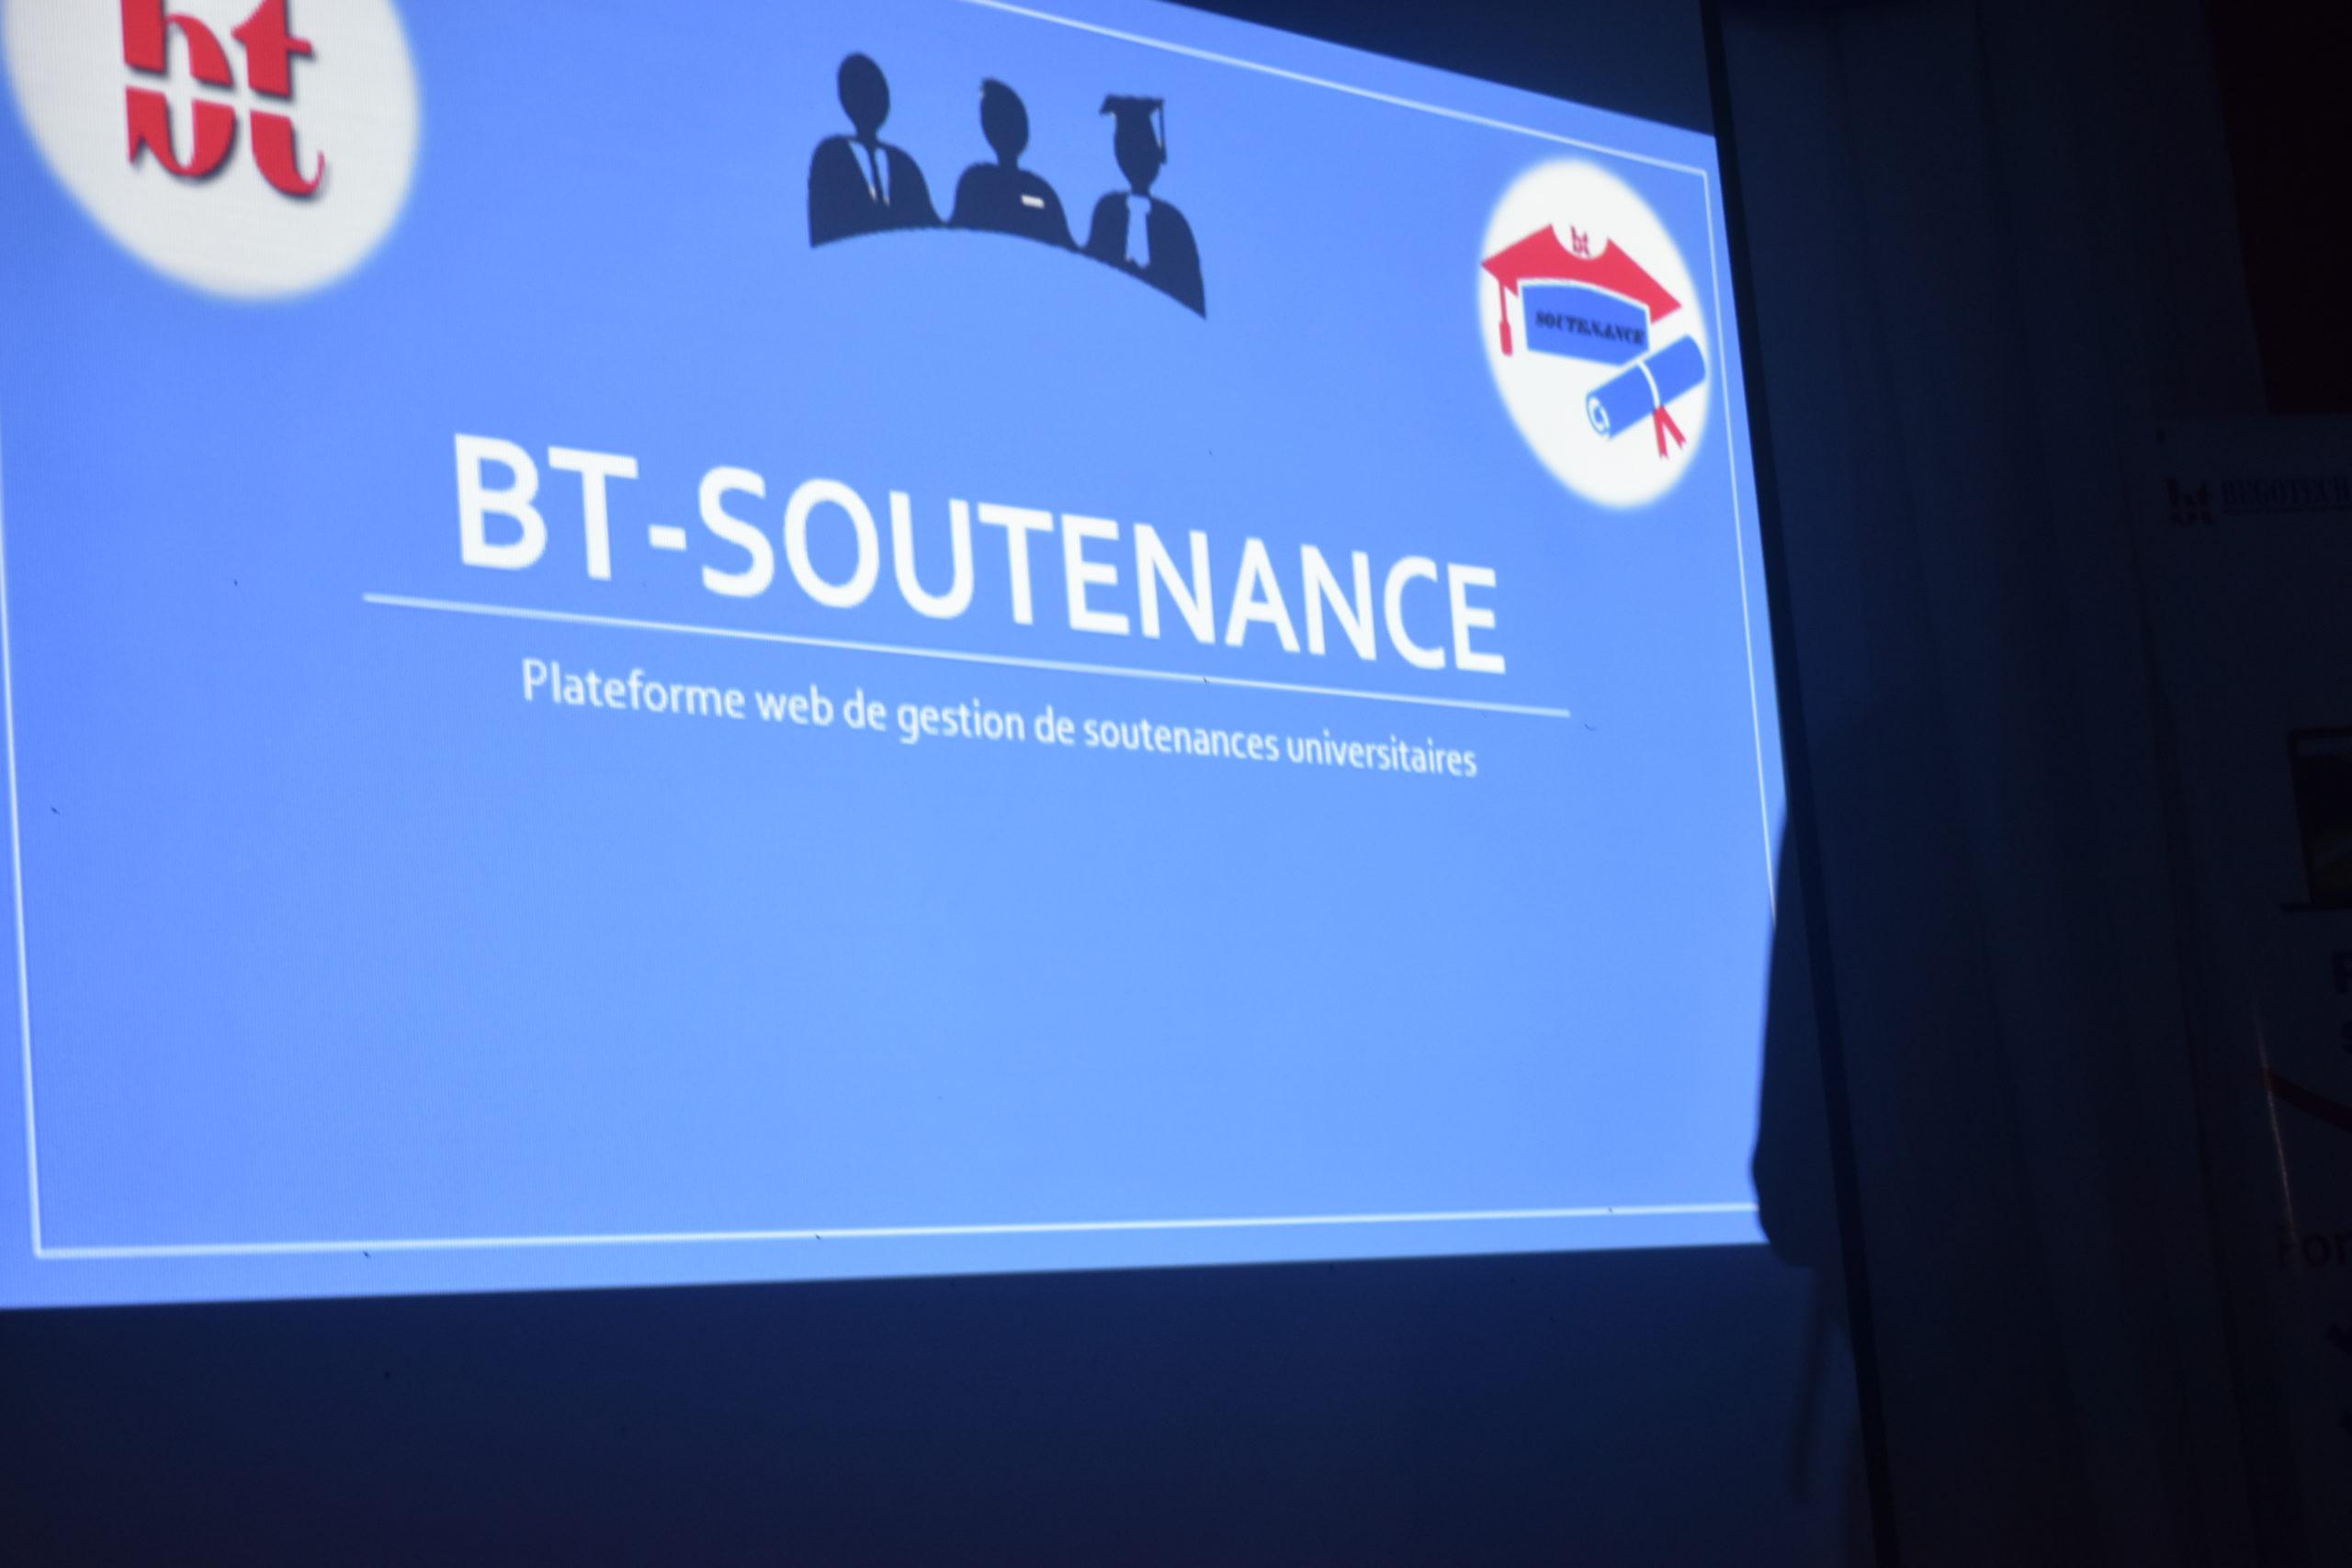 BT Soutenance